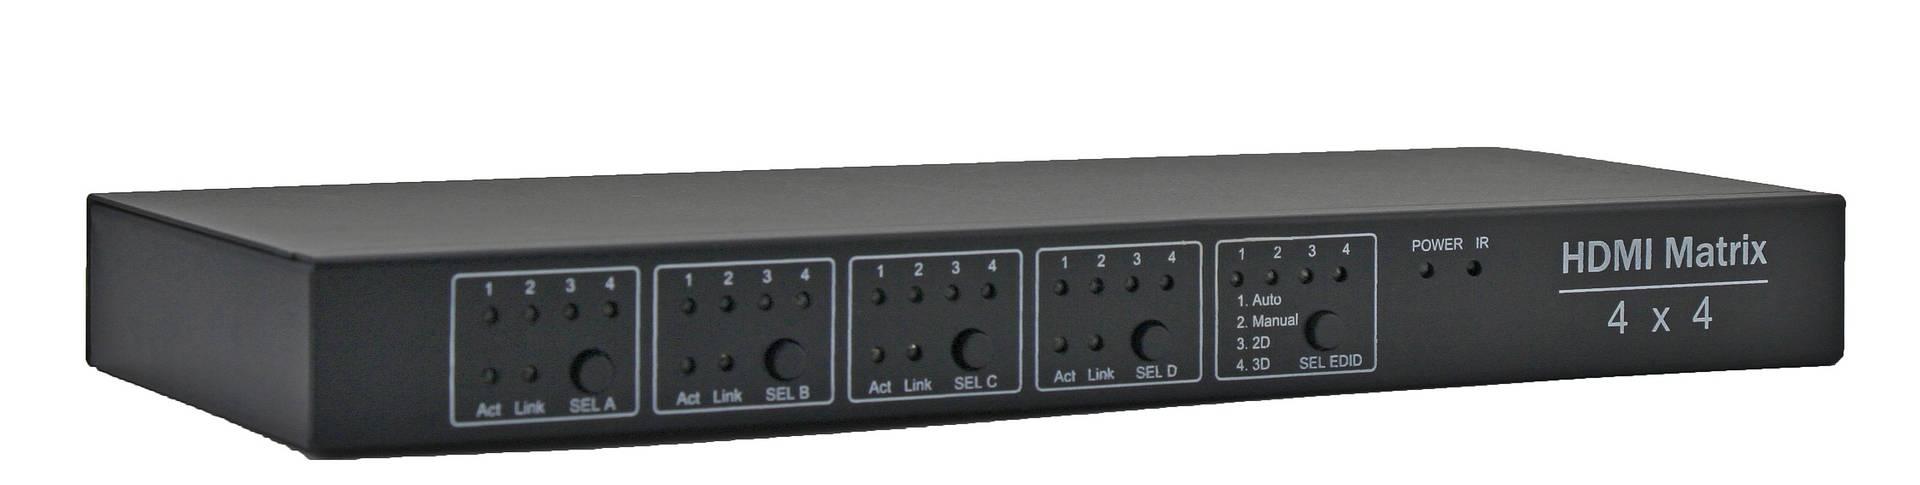 4x4 HDMI matrix , support IR routing